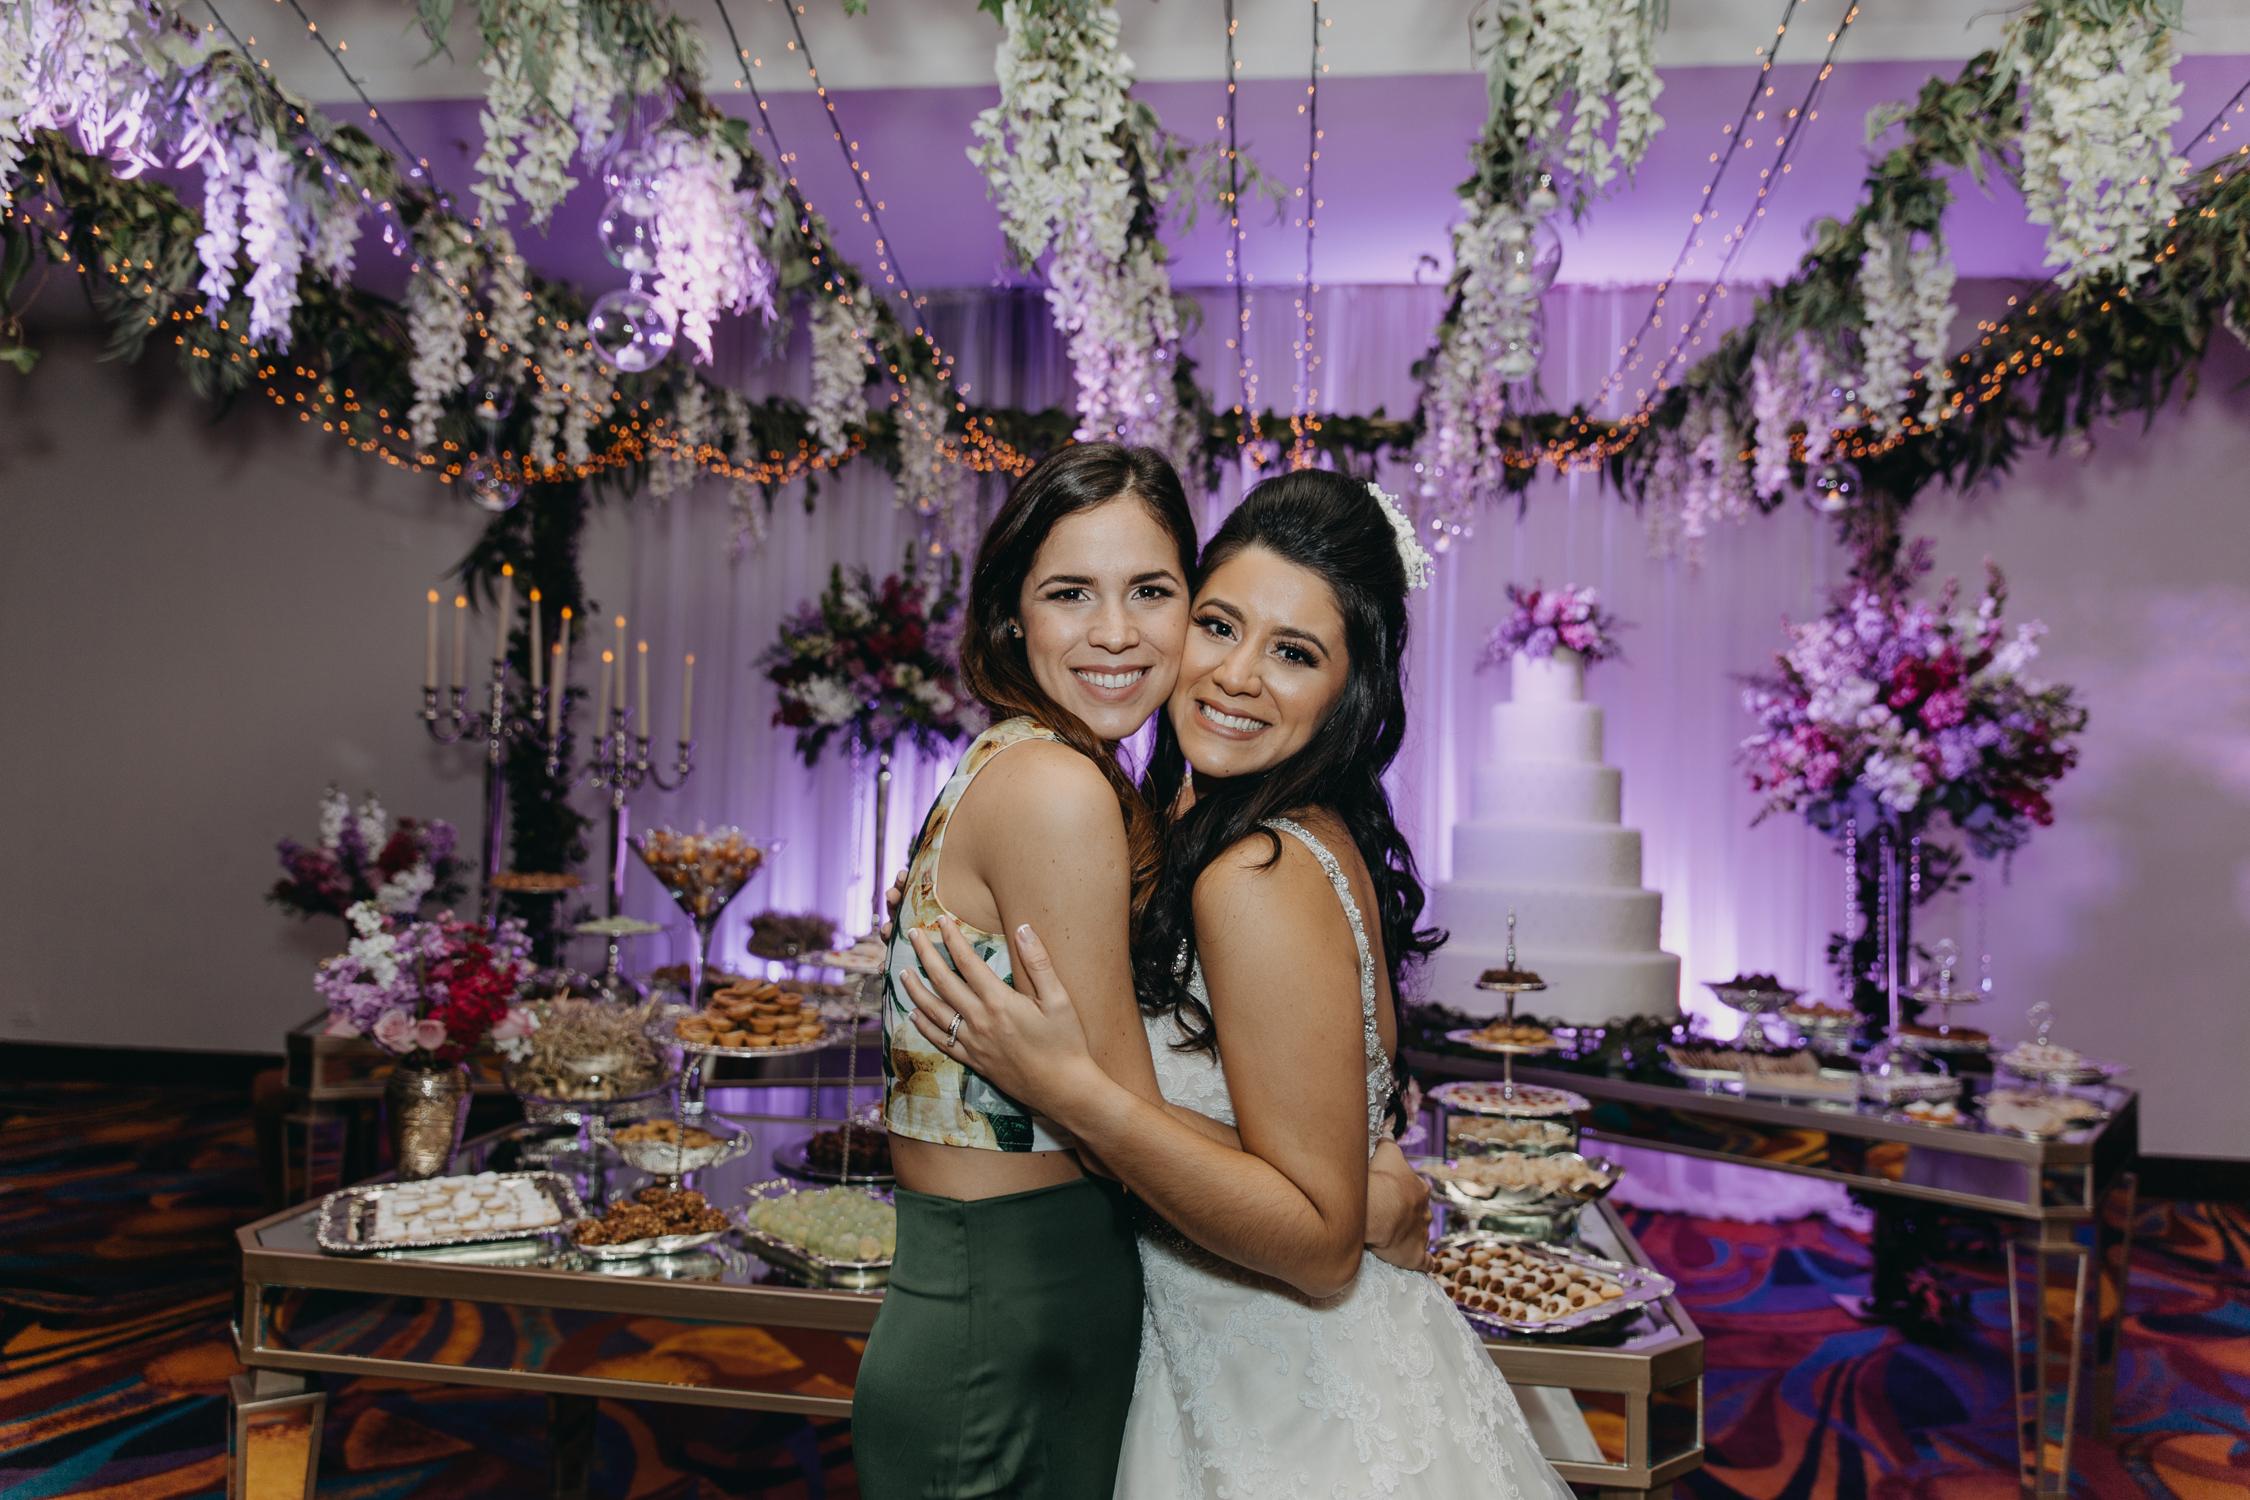 Michelle-Agurto-Fotografia-Bodas-Ecuador-Destination-Wedding-Photographer-Daniela-Dirk-60.JPG